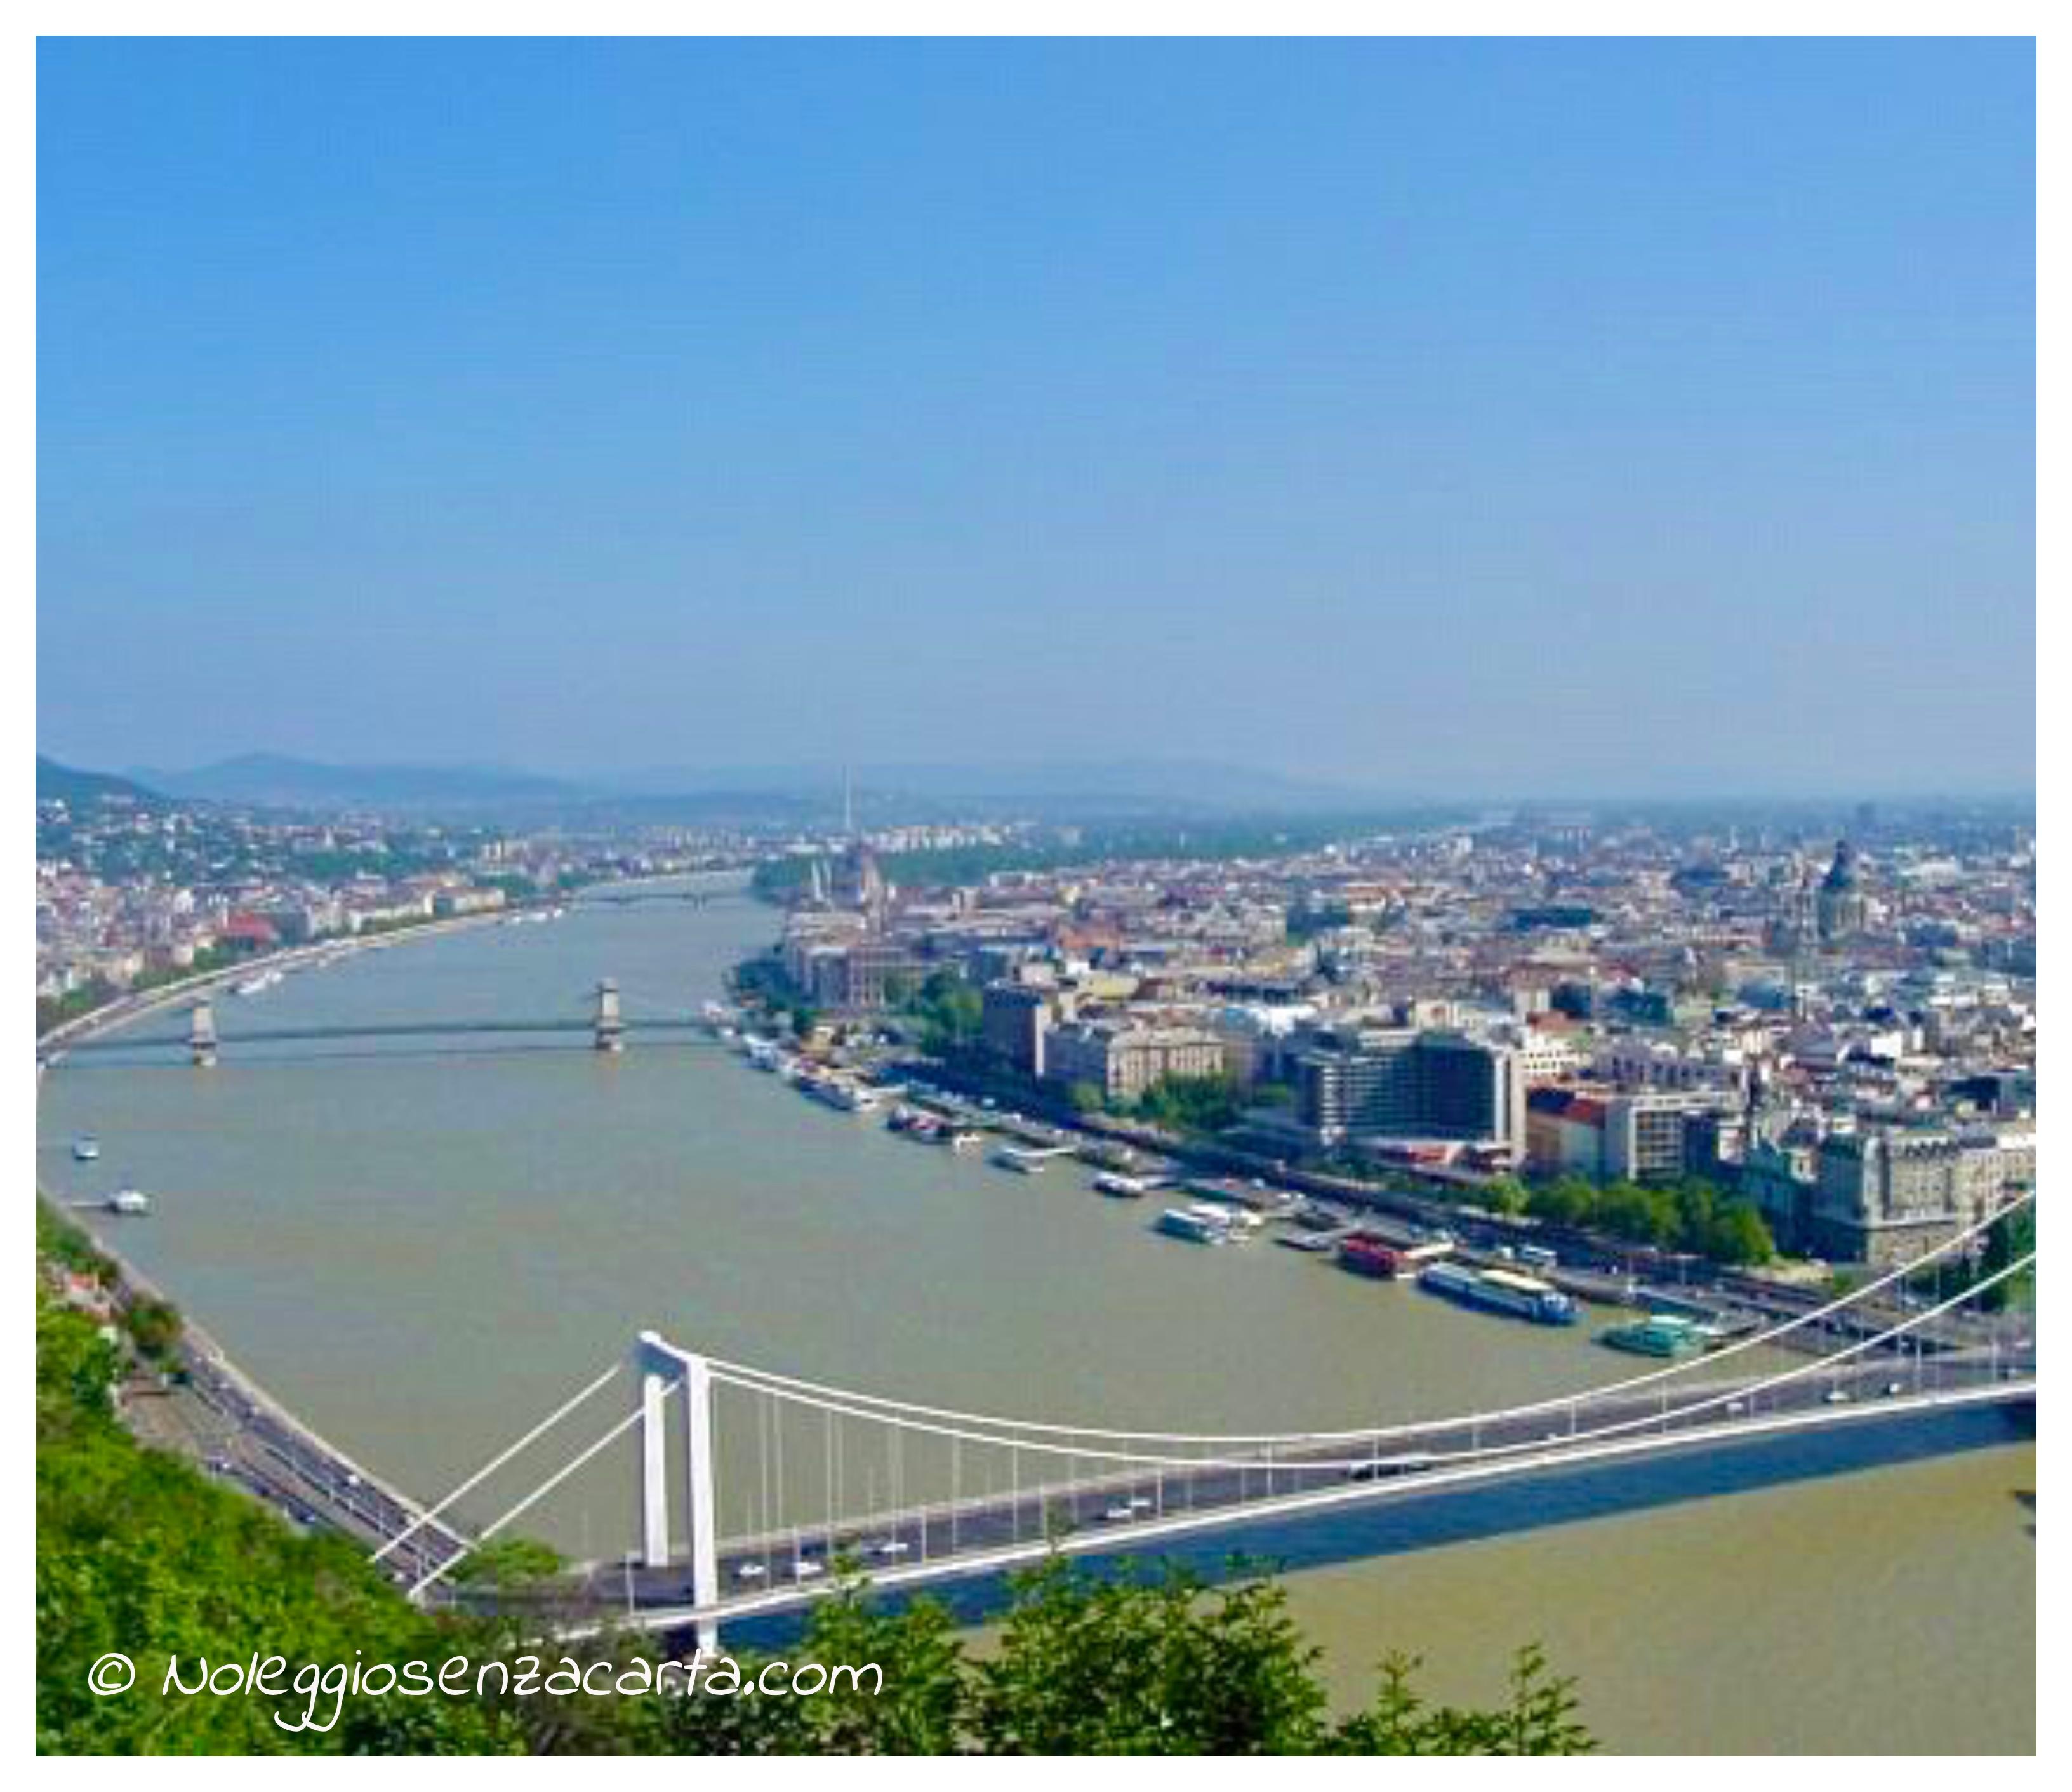 Alquiler coche Budapest sin tarjeta de crédito